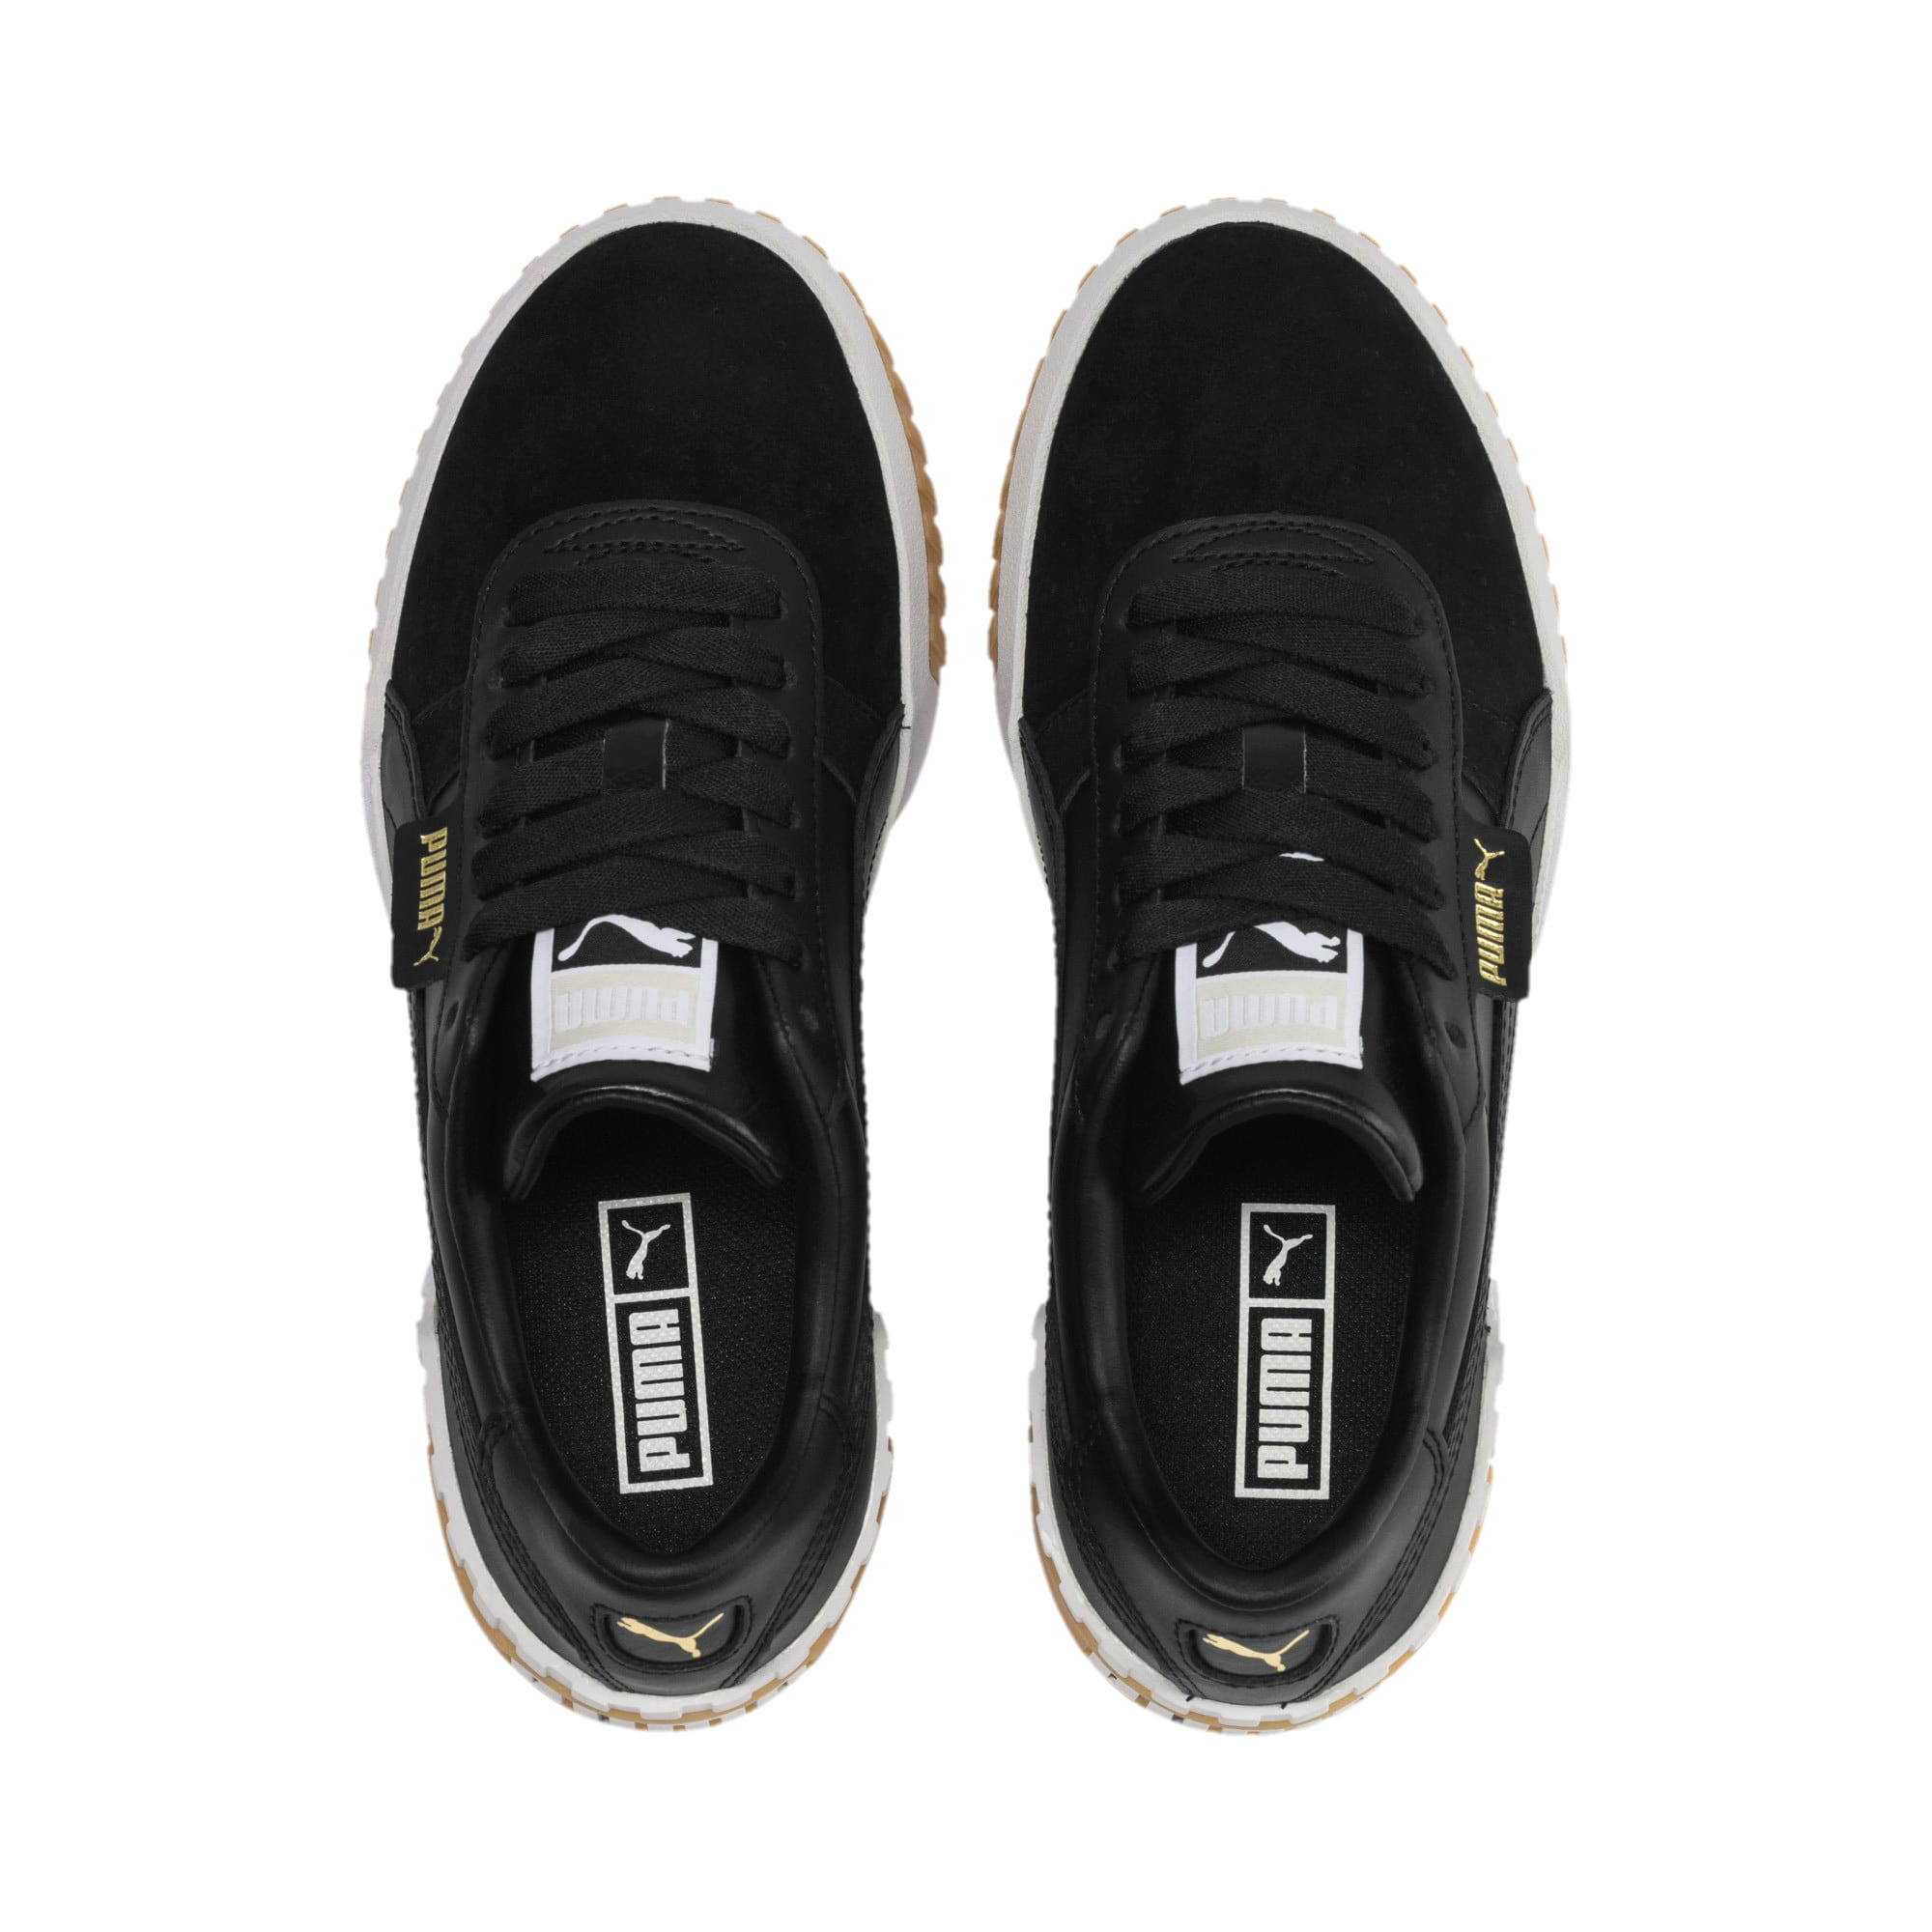 Thumbnail 6 of Cali Exotic Damen Sneaker, Puma Black-Puma Black, medium